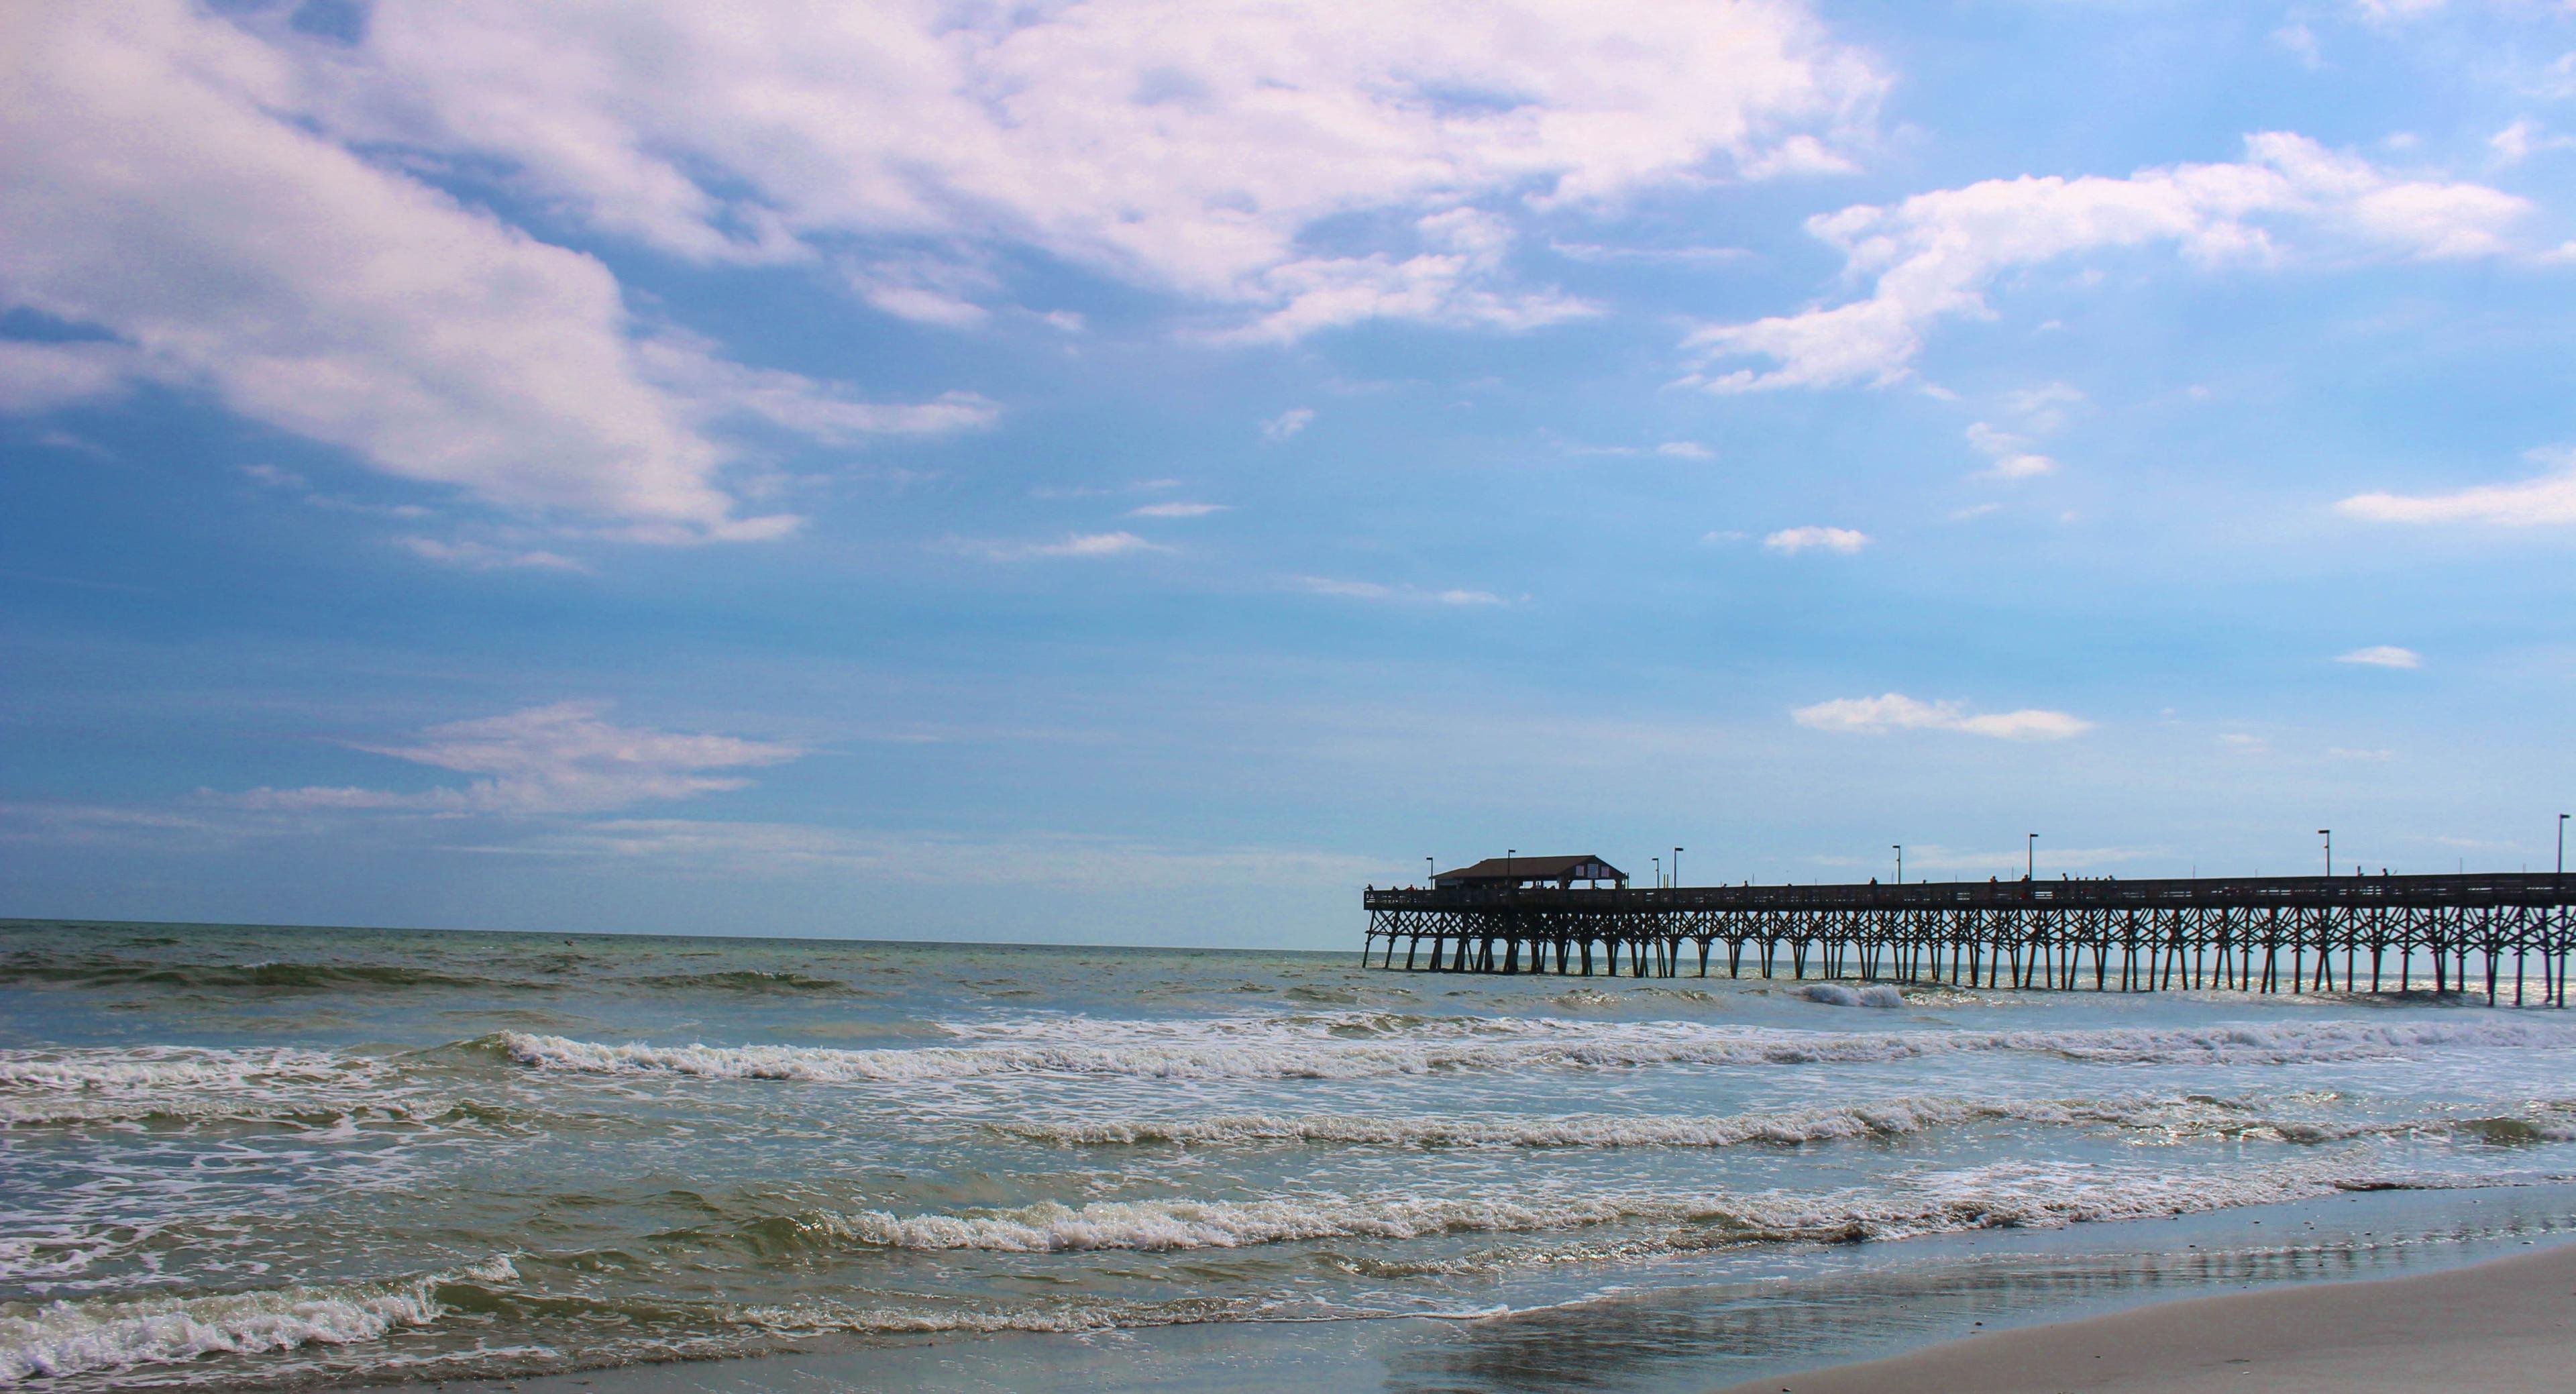 Pier at Garden City, Murrells Inlet, South Carolina, United States of America